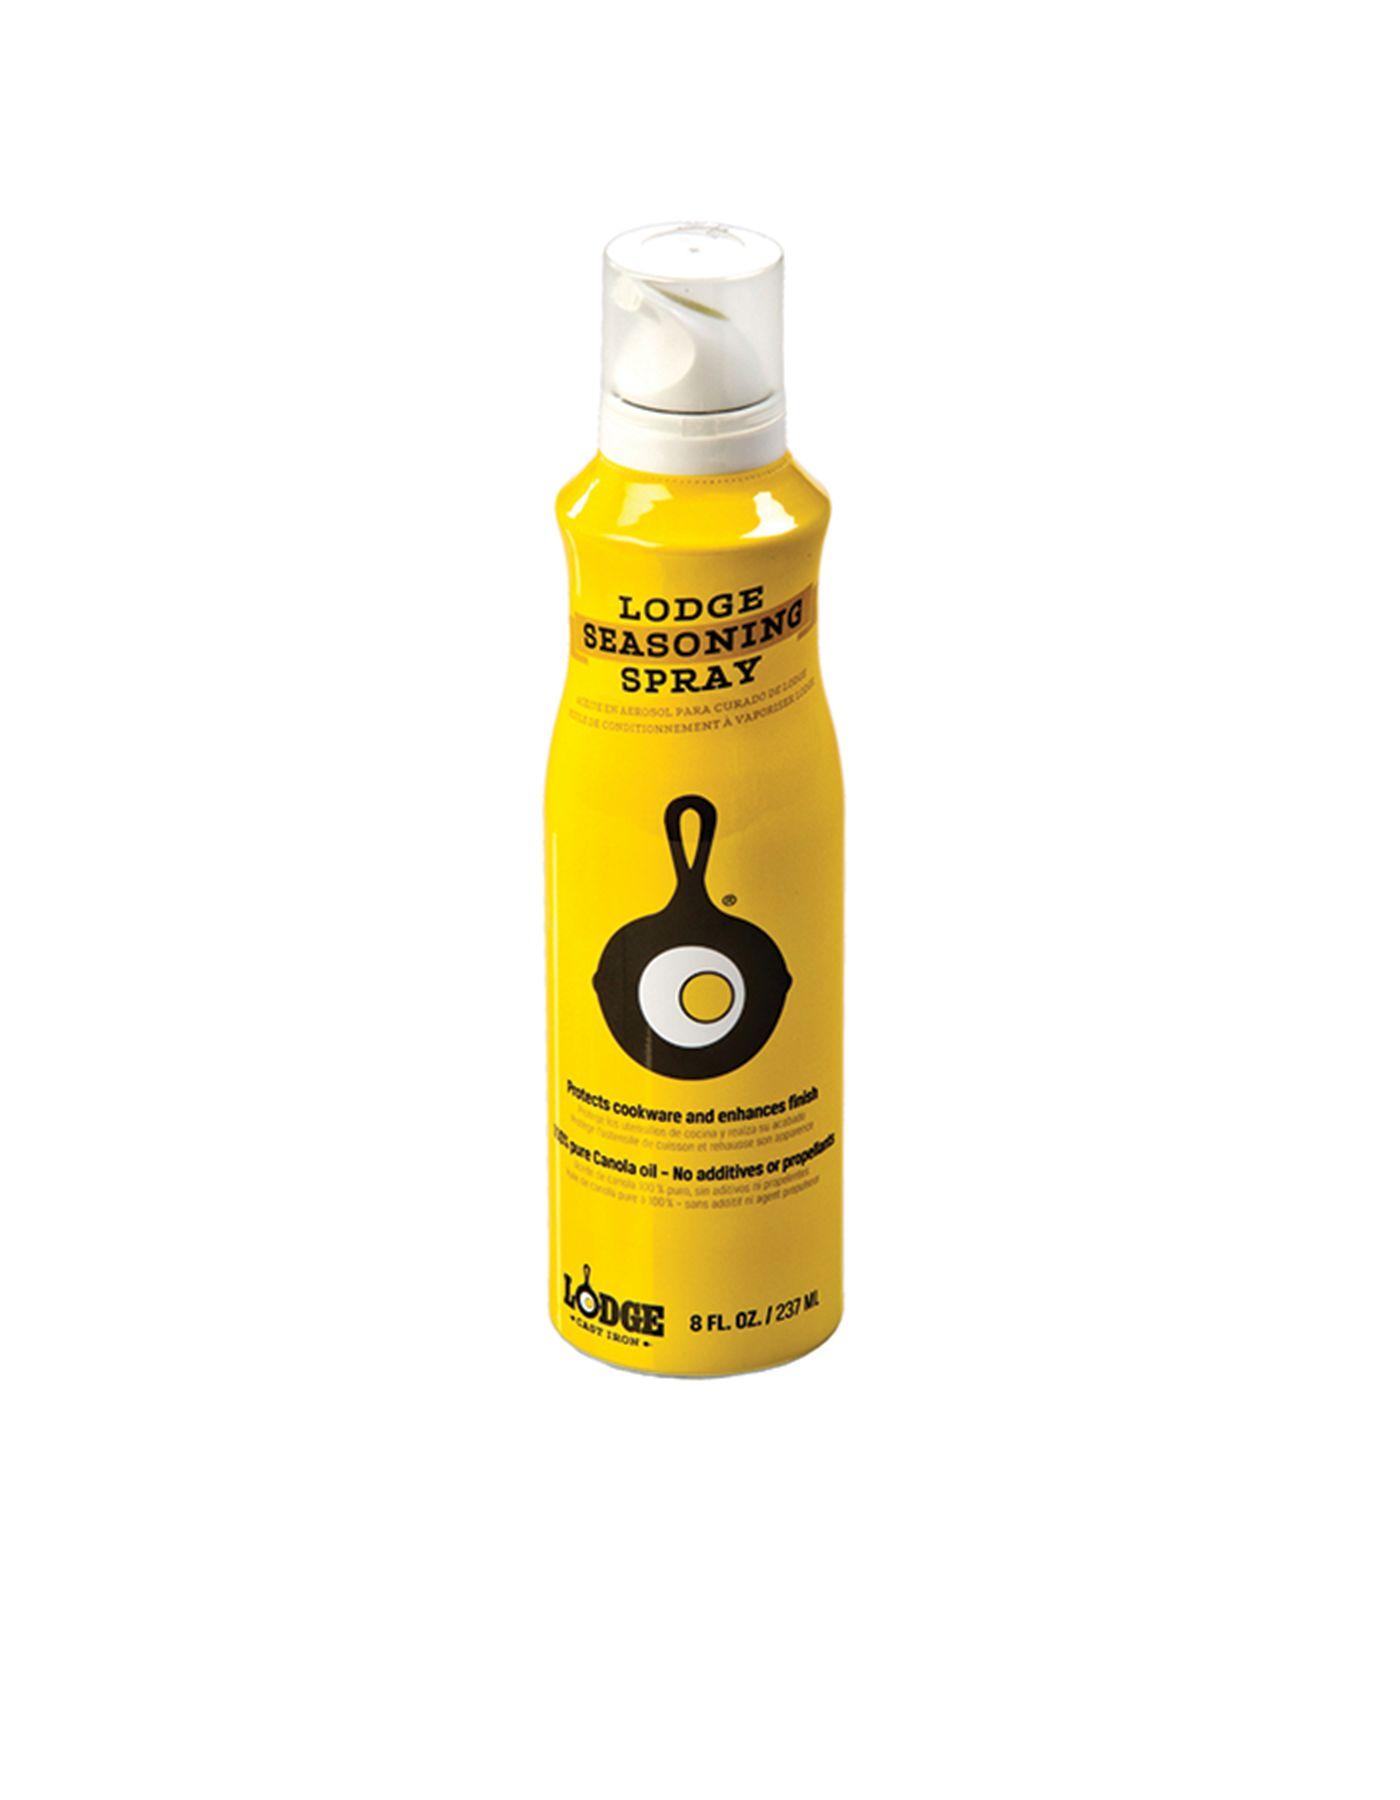 Lodge Seasoning Spray